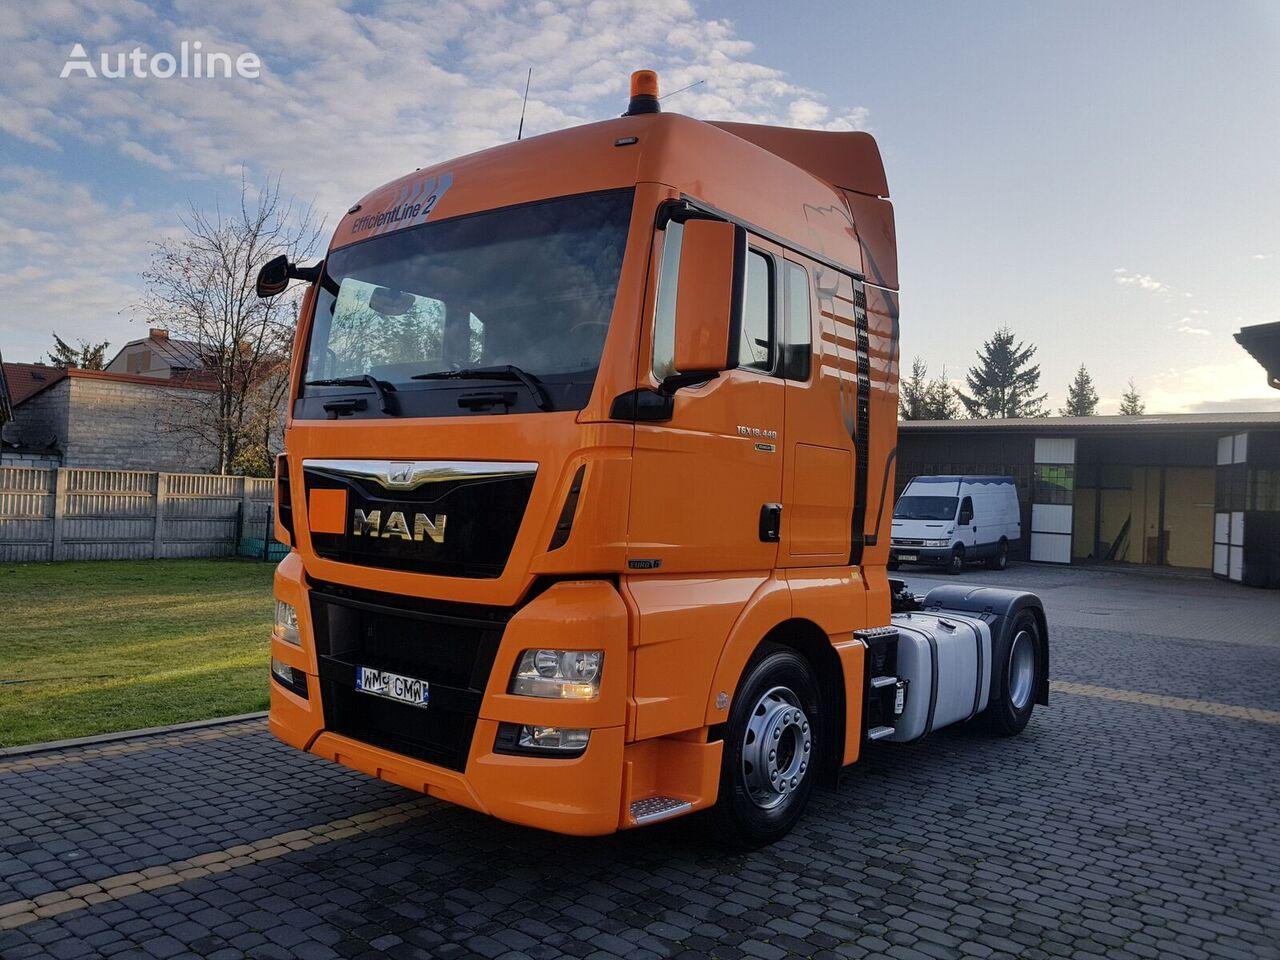 trattore stradale MAN TGX 18.440 E6 FULL ADR  EfficientLine 2 , 2015r